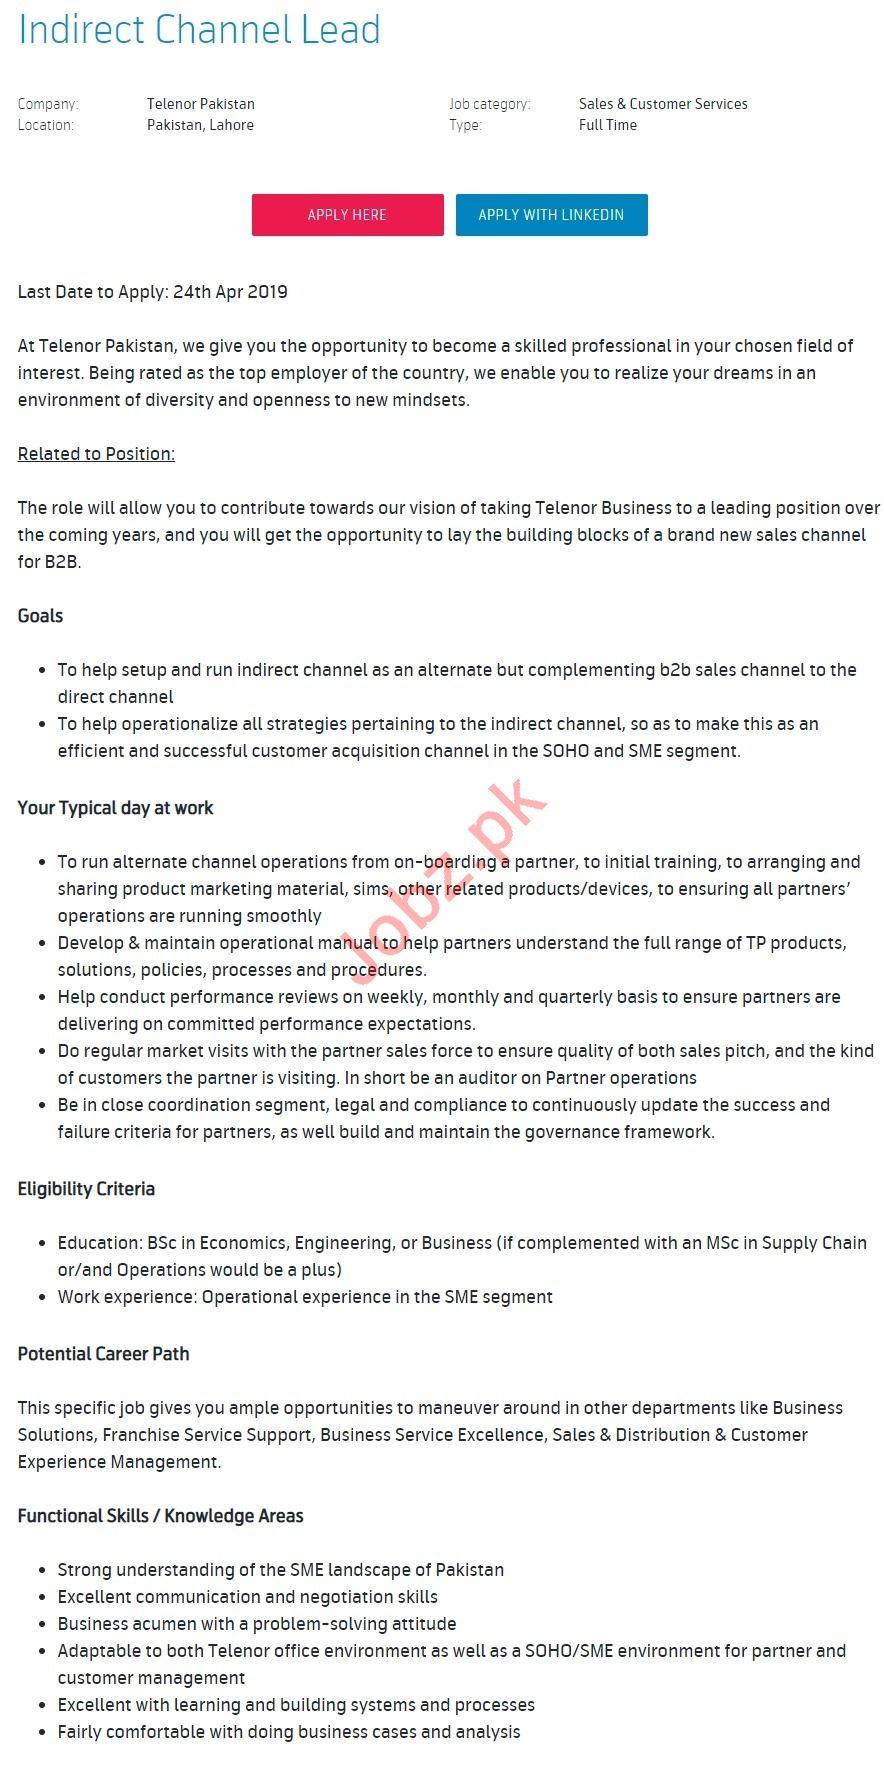 Telenor Pakistan Jobs 2019 for Indirect Channel Lead